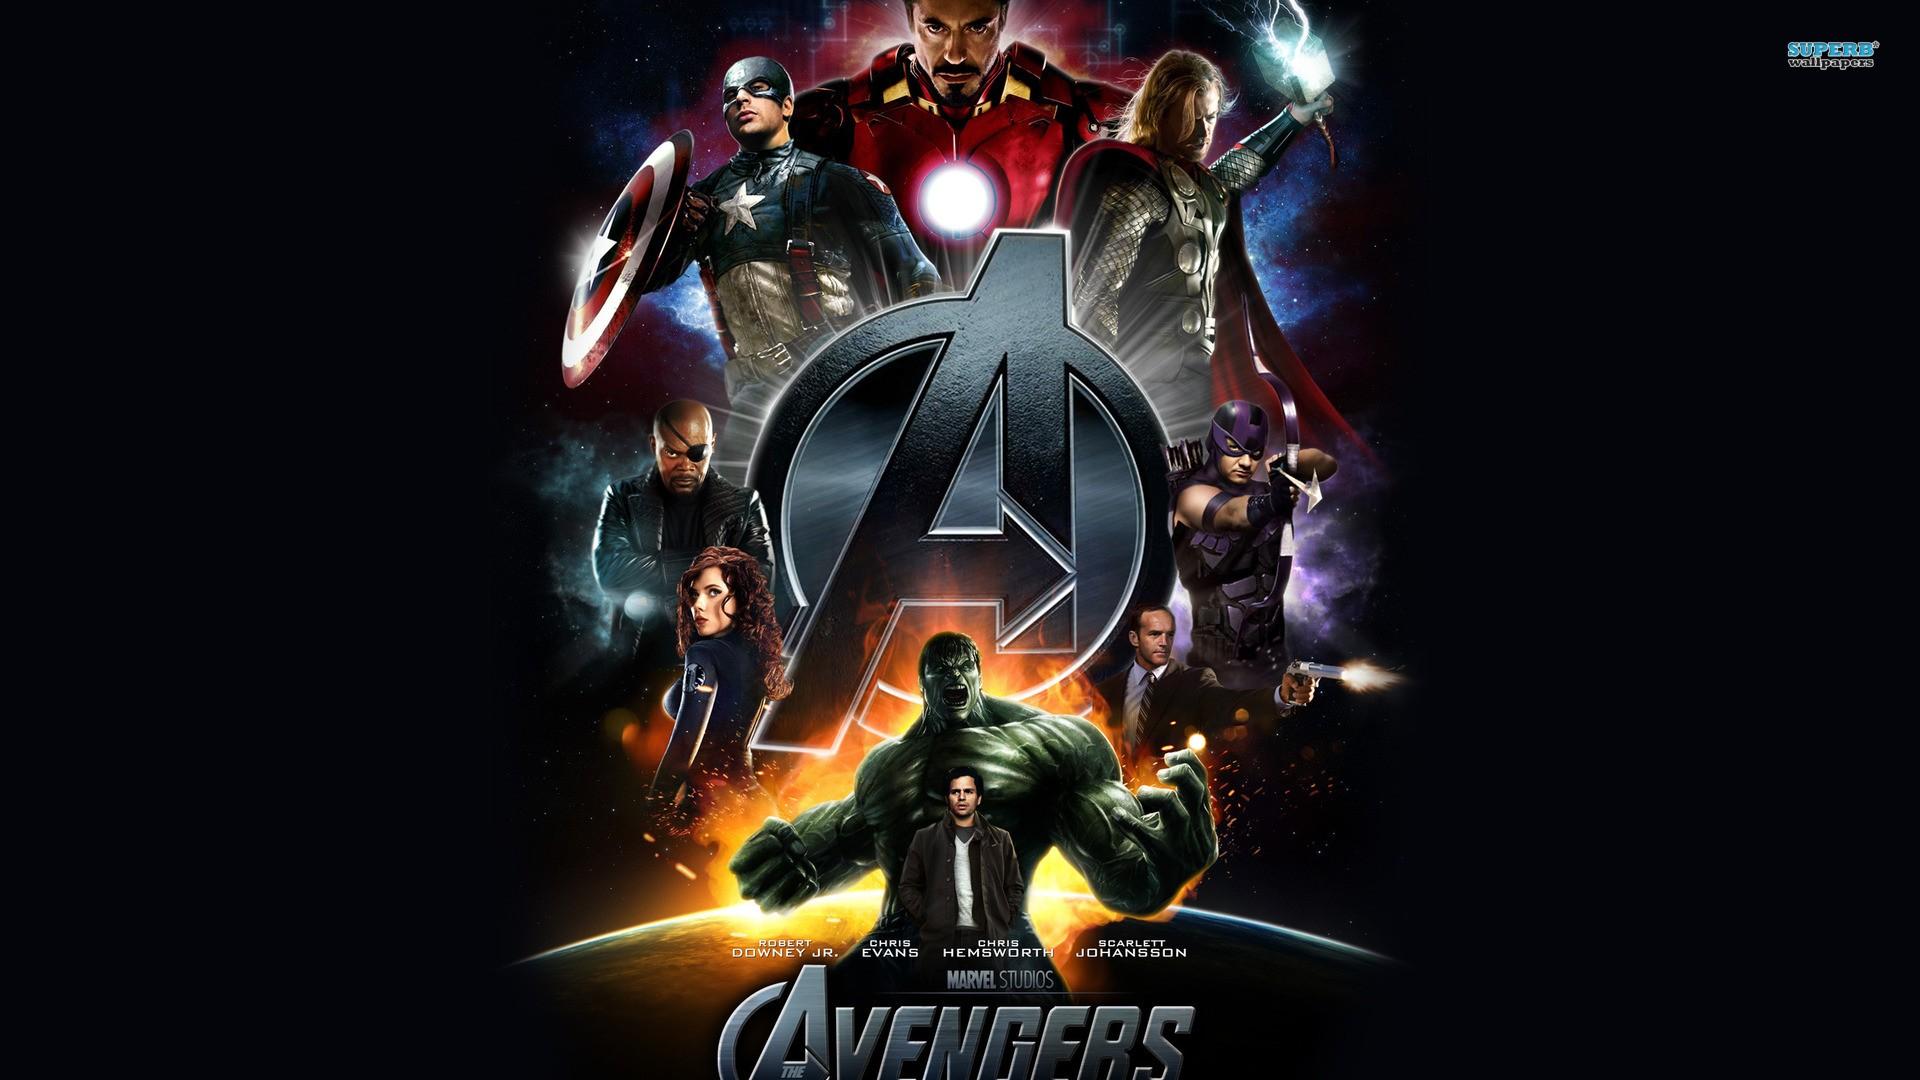 wallpaper : thor, superhero, iron man, hulk, captain america, the